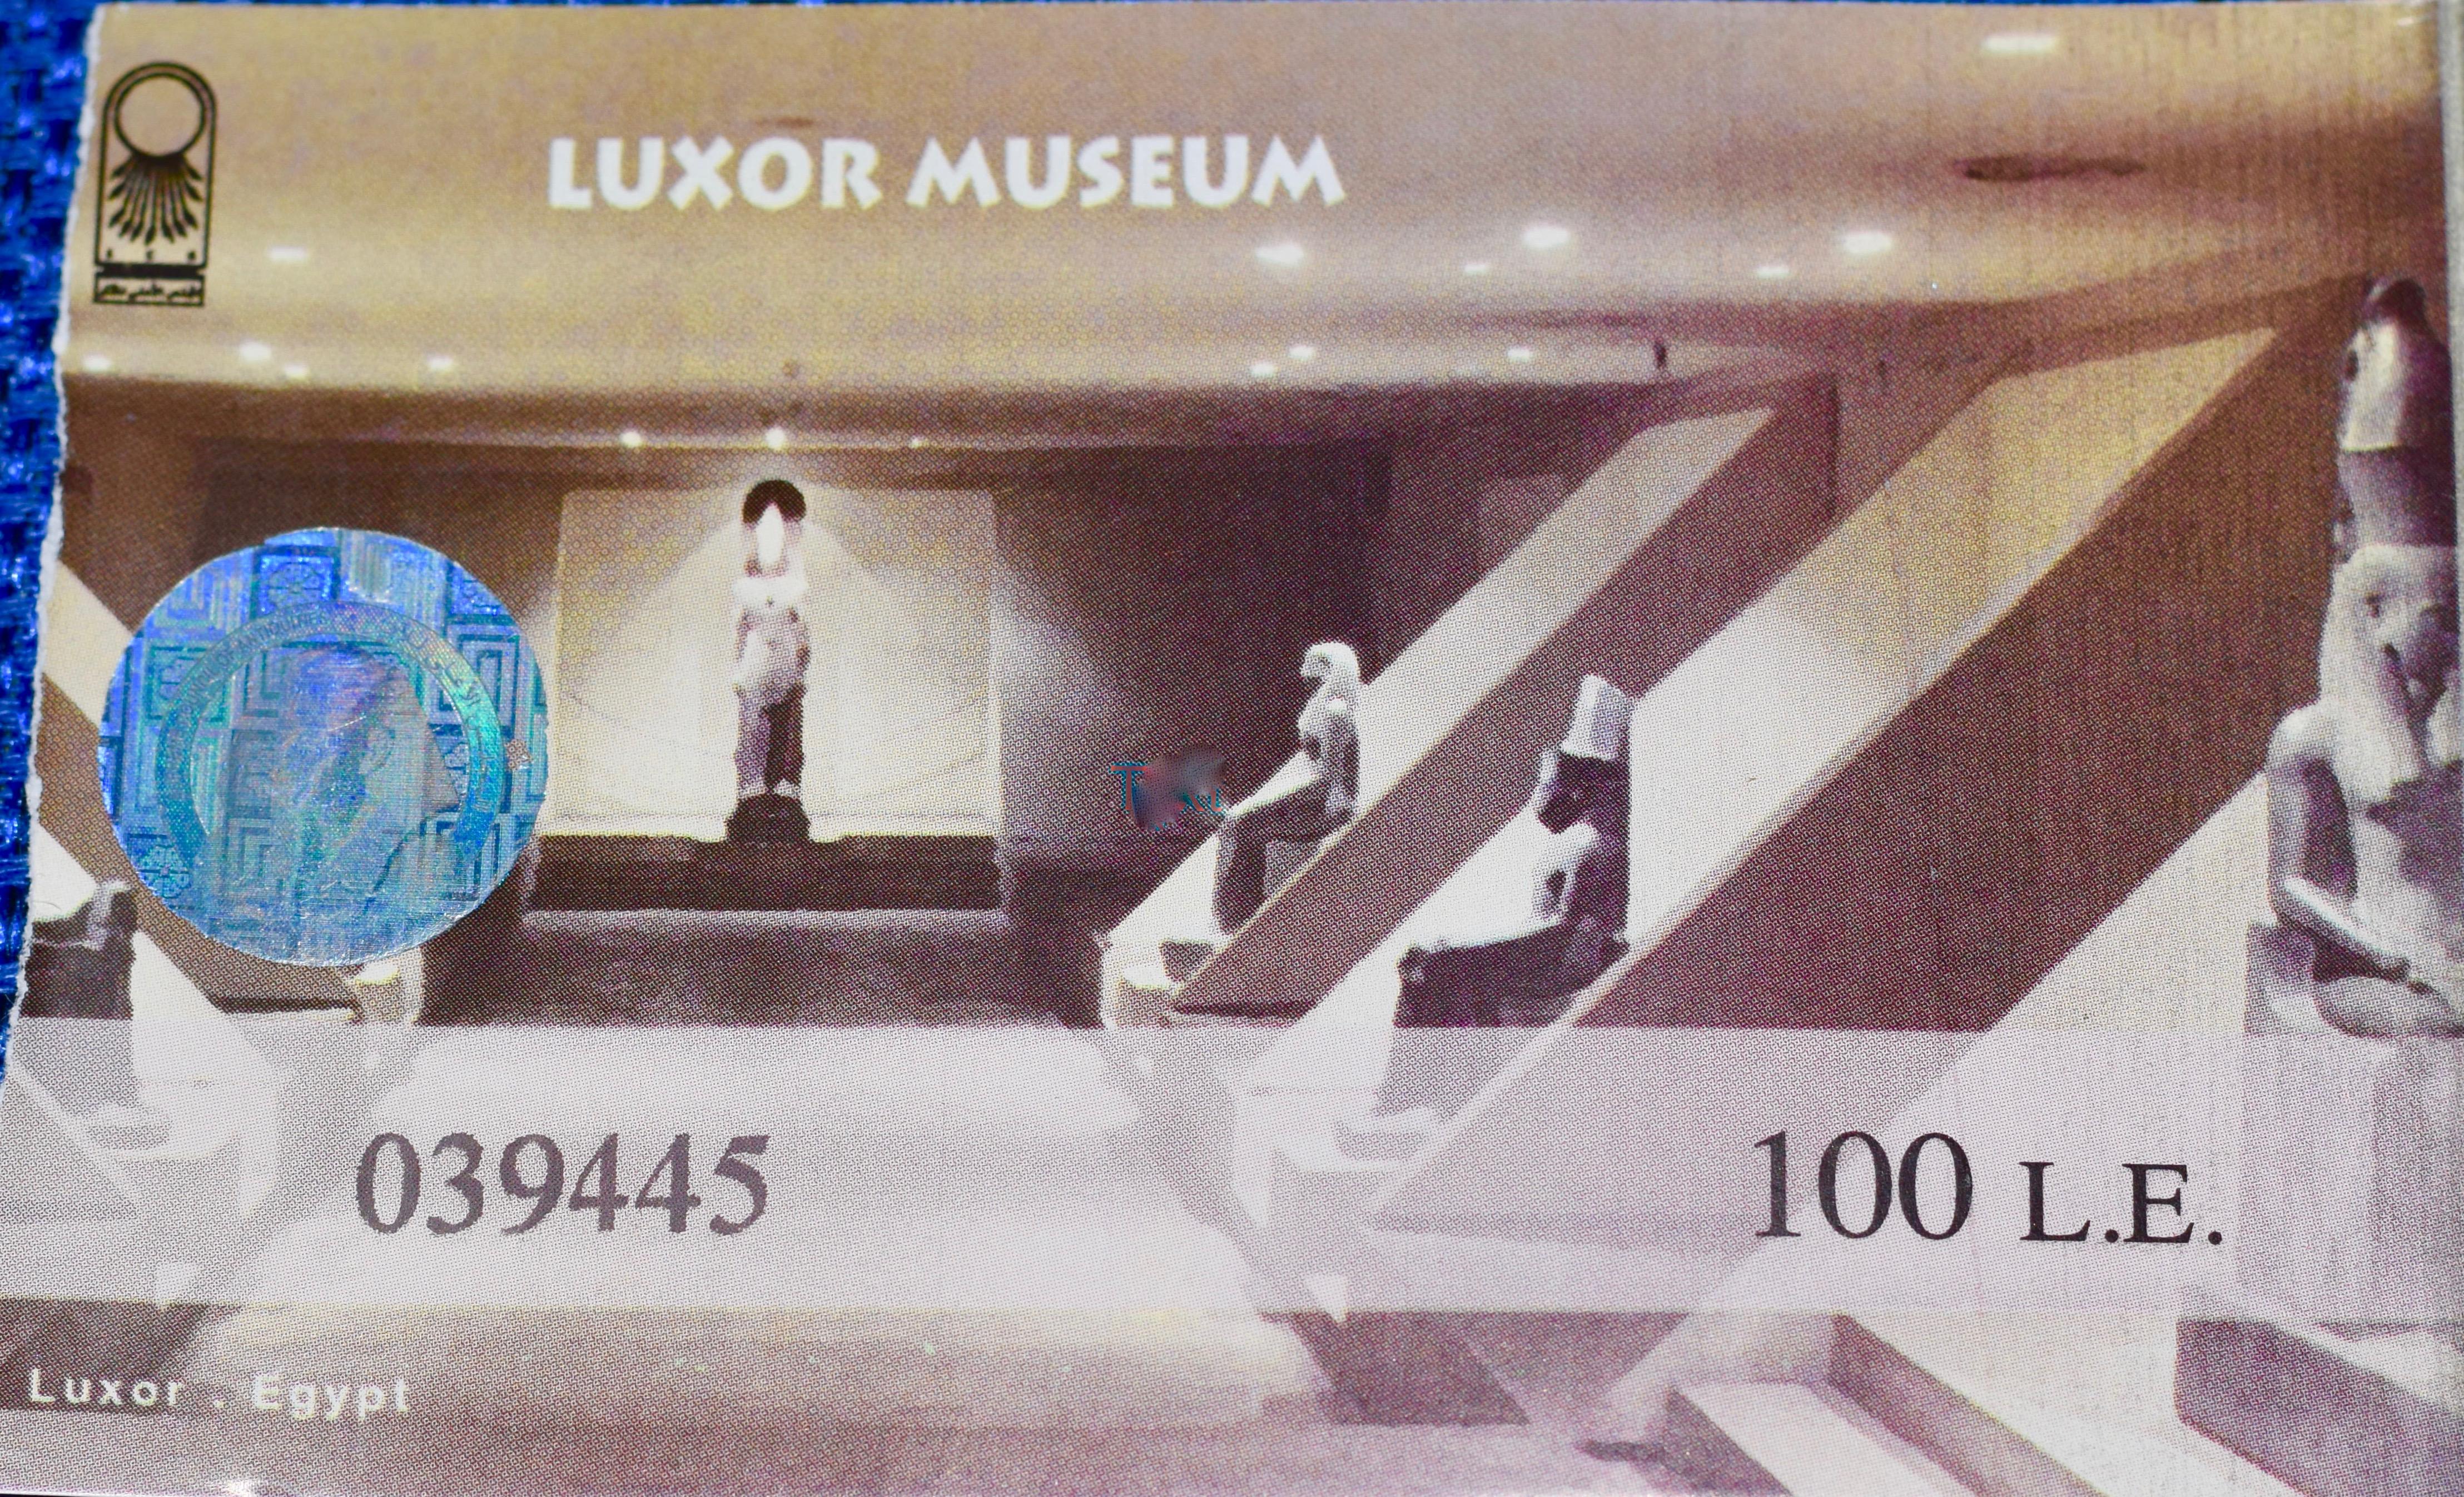 Luxor Museum Ticket